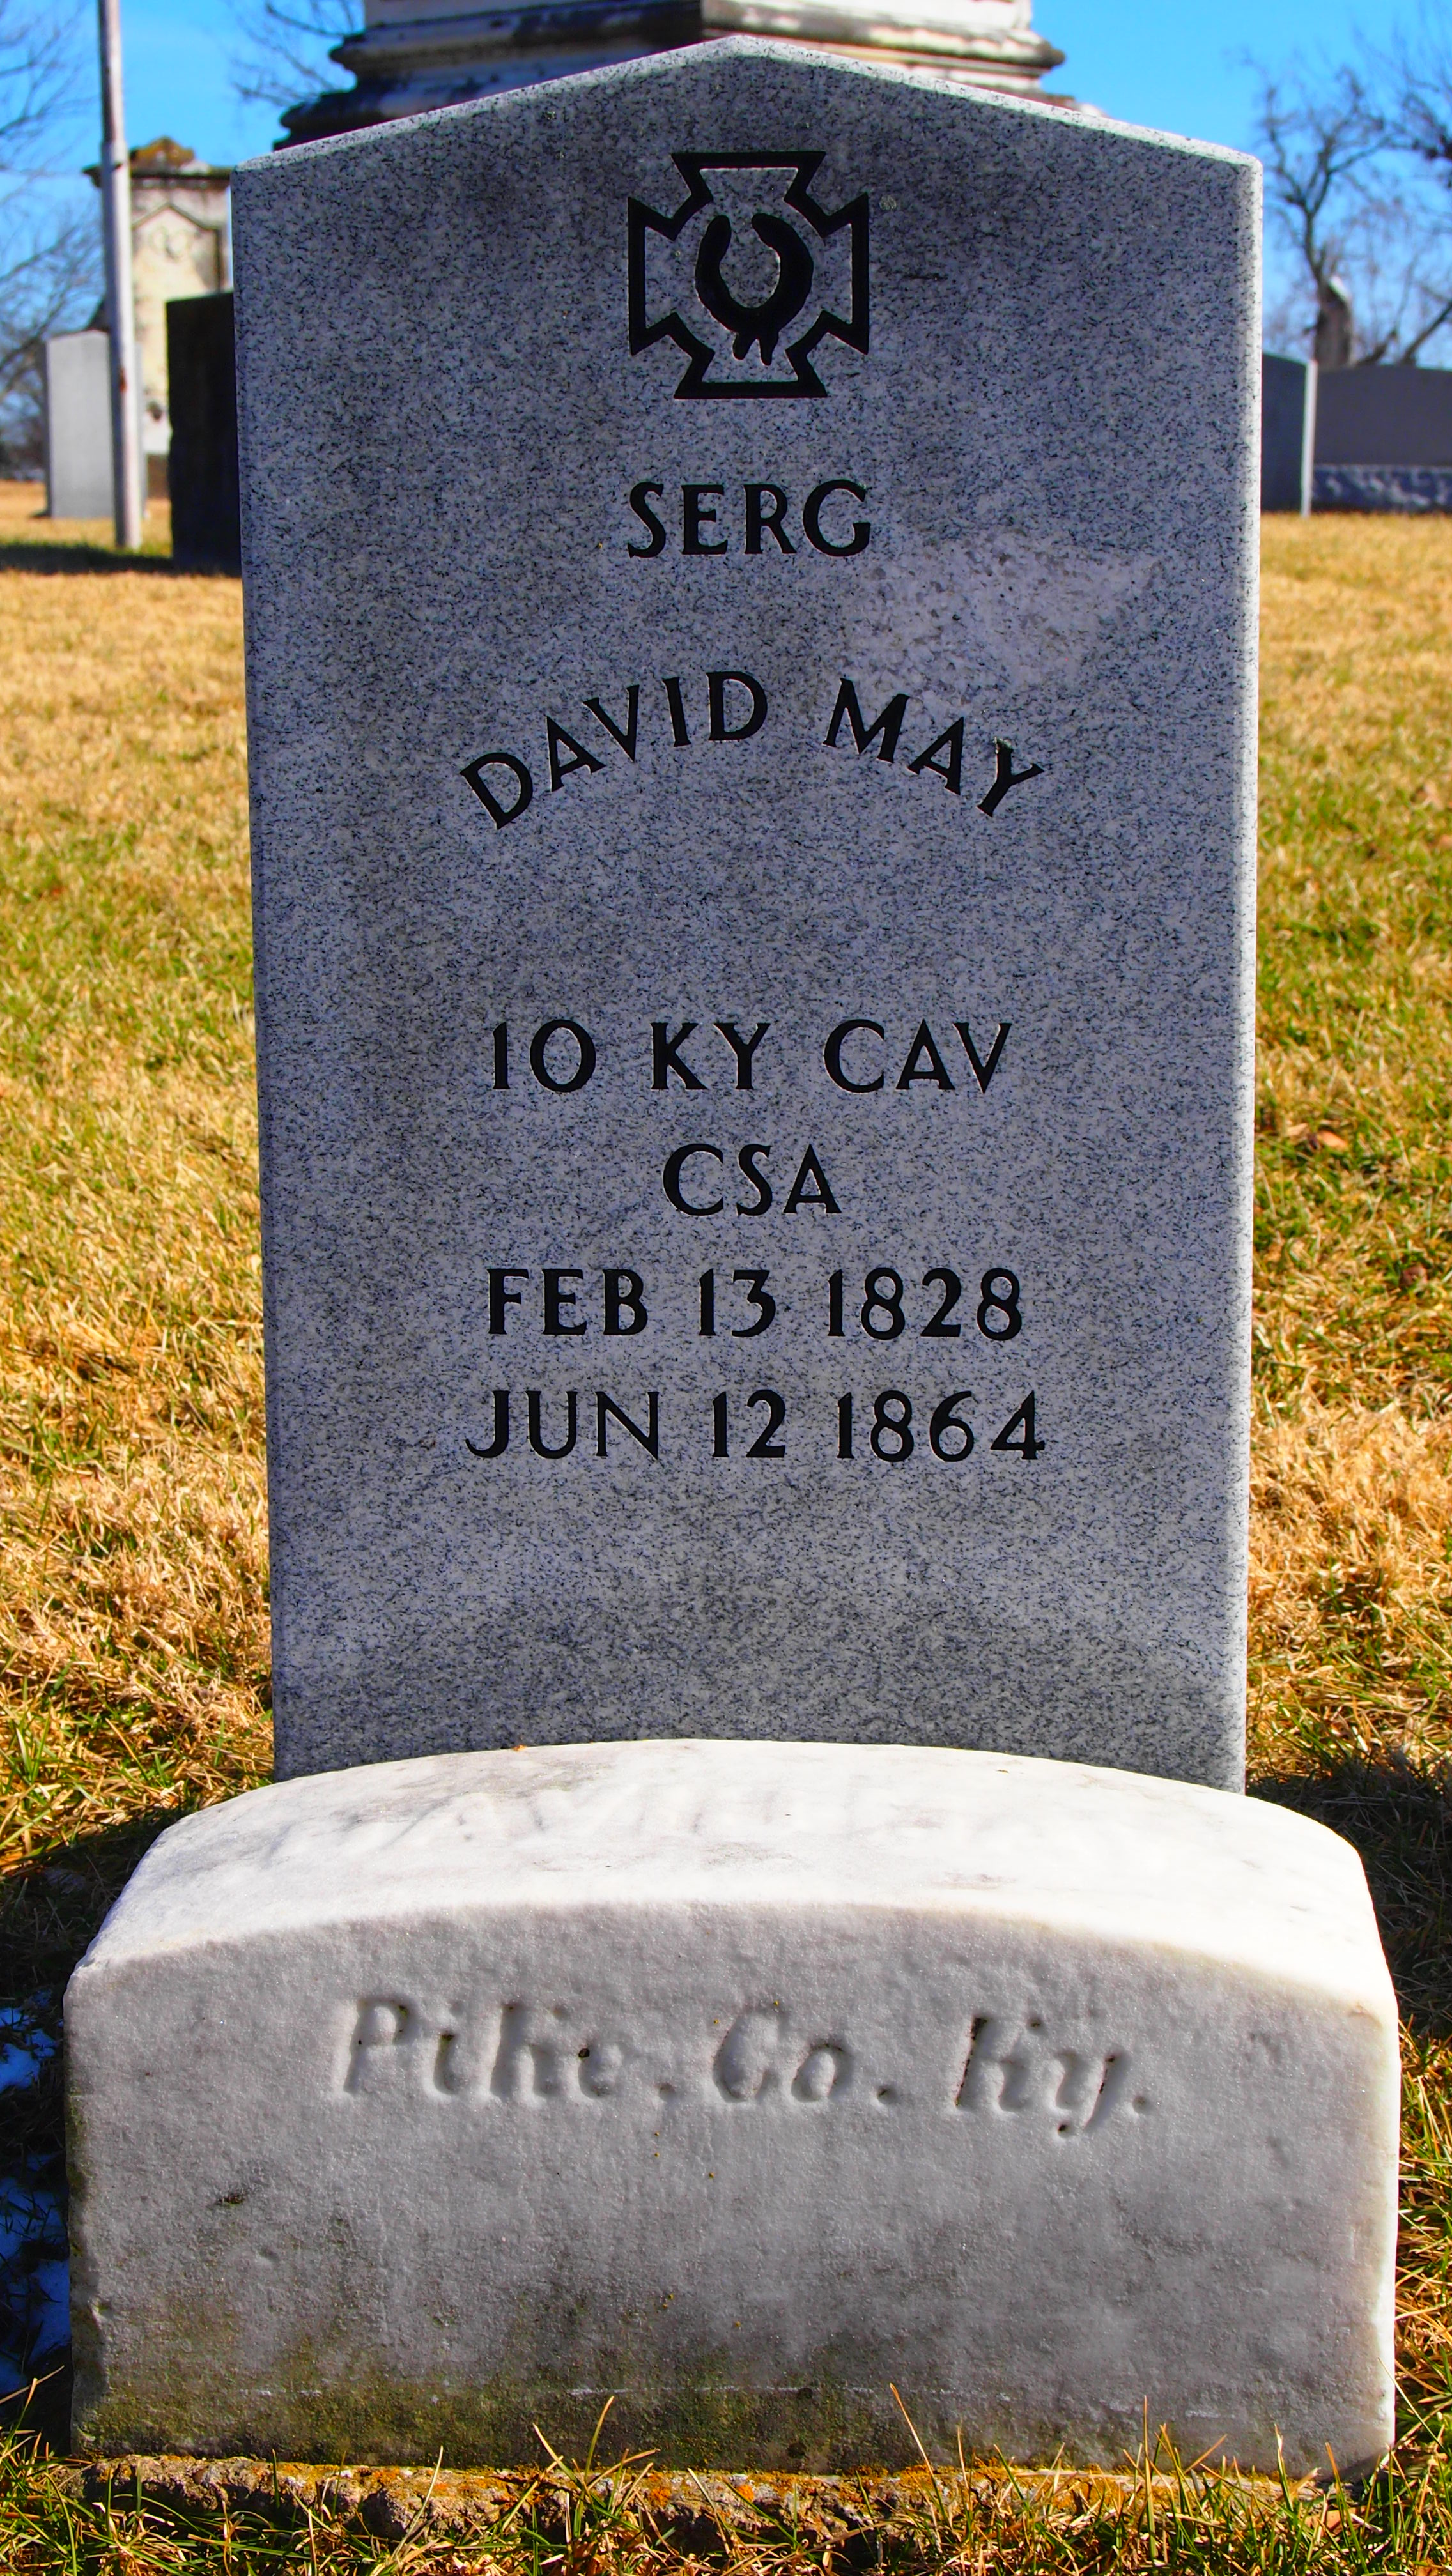 Headstone Closeup